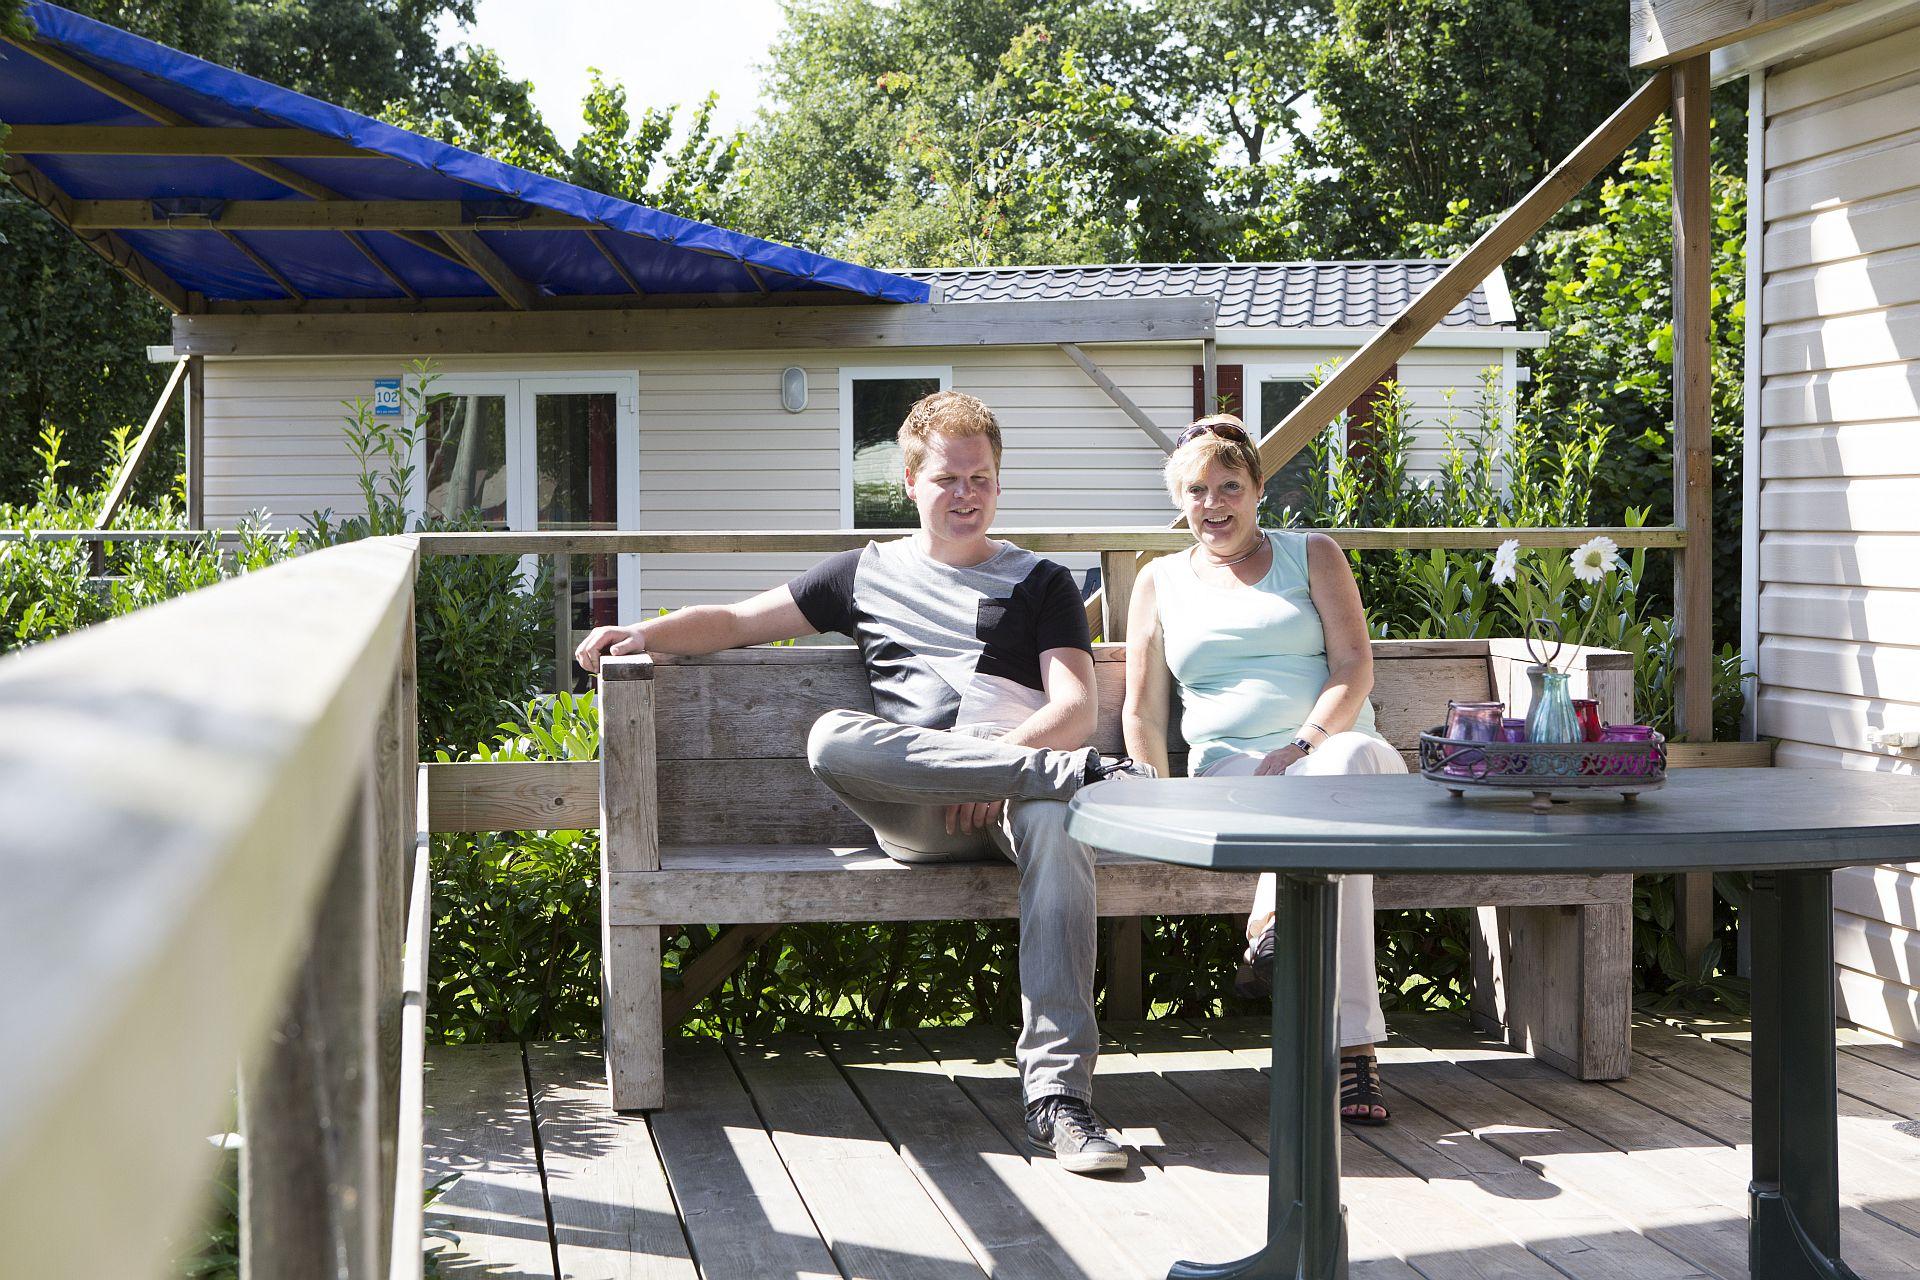 Himmelfahrt-Arrangement auf Ferienpark Het Stoetenslagh. -